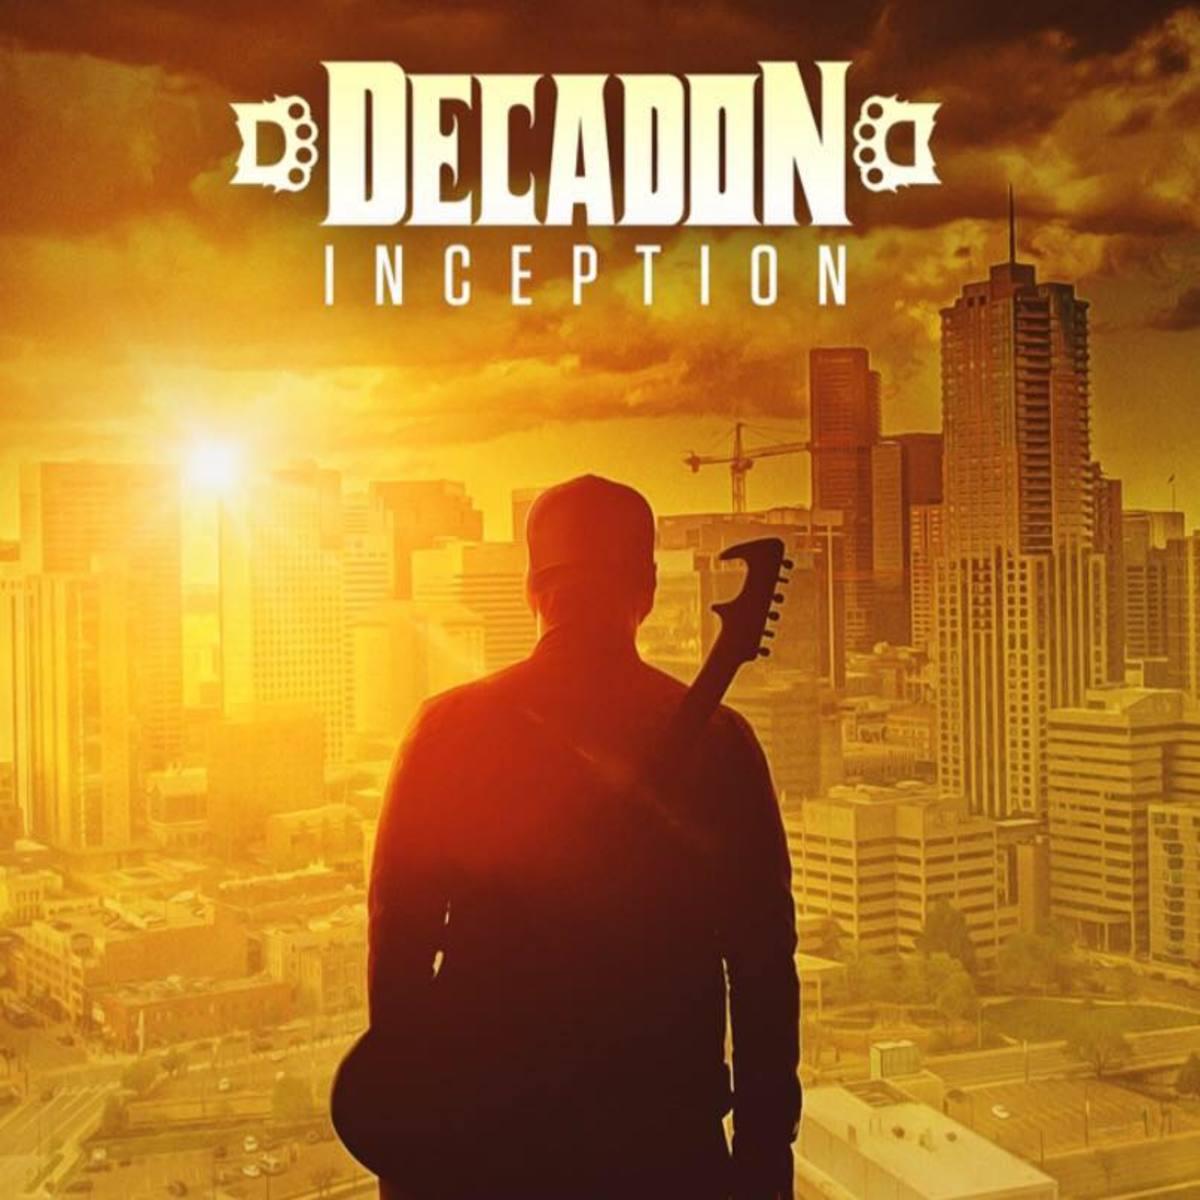 "Decadon New Single ""Inception"" on KJ SAWKA's Impossible Records (Colorado, Global Dance Music / EDM.com)"